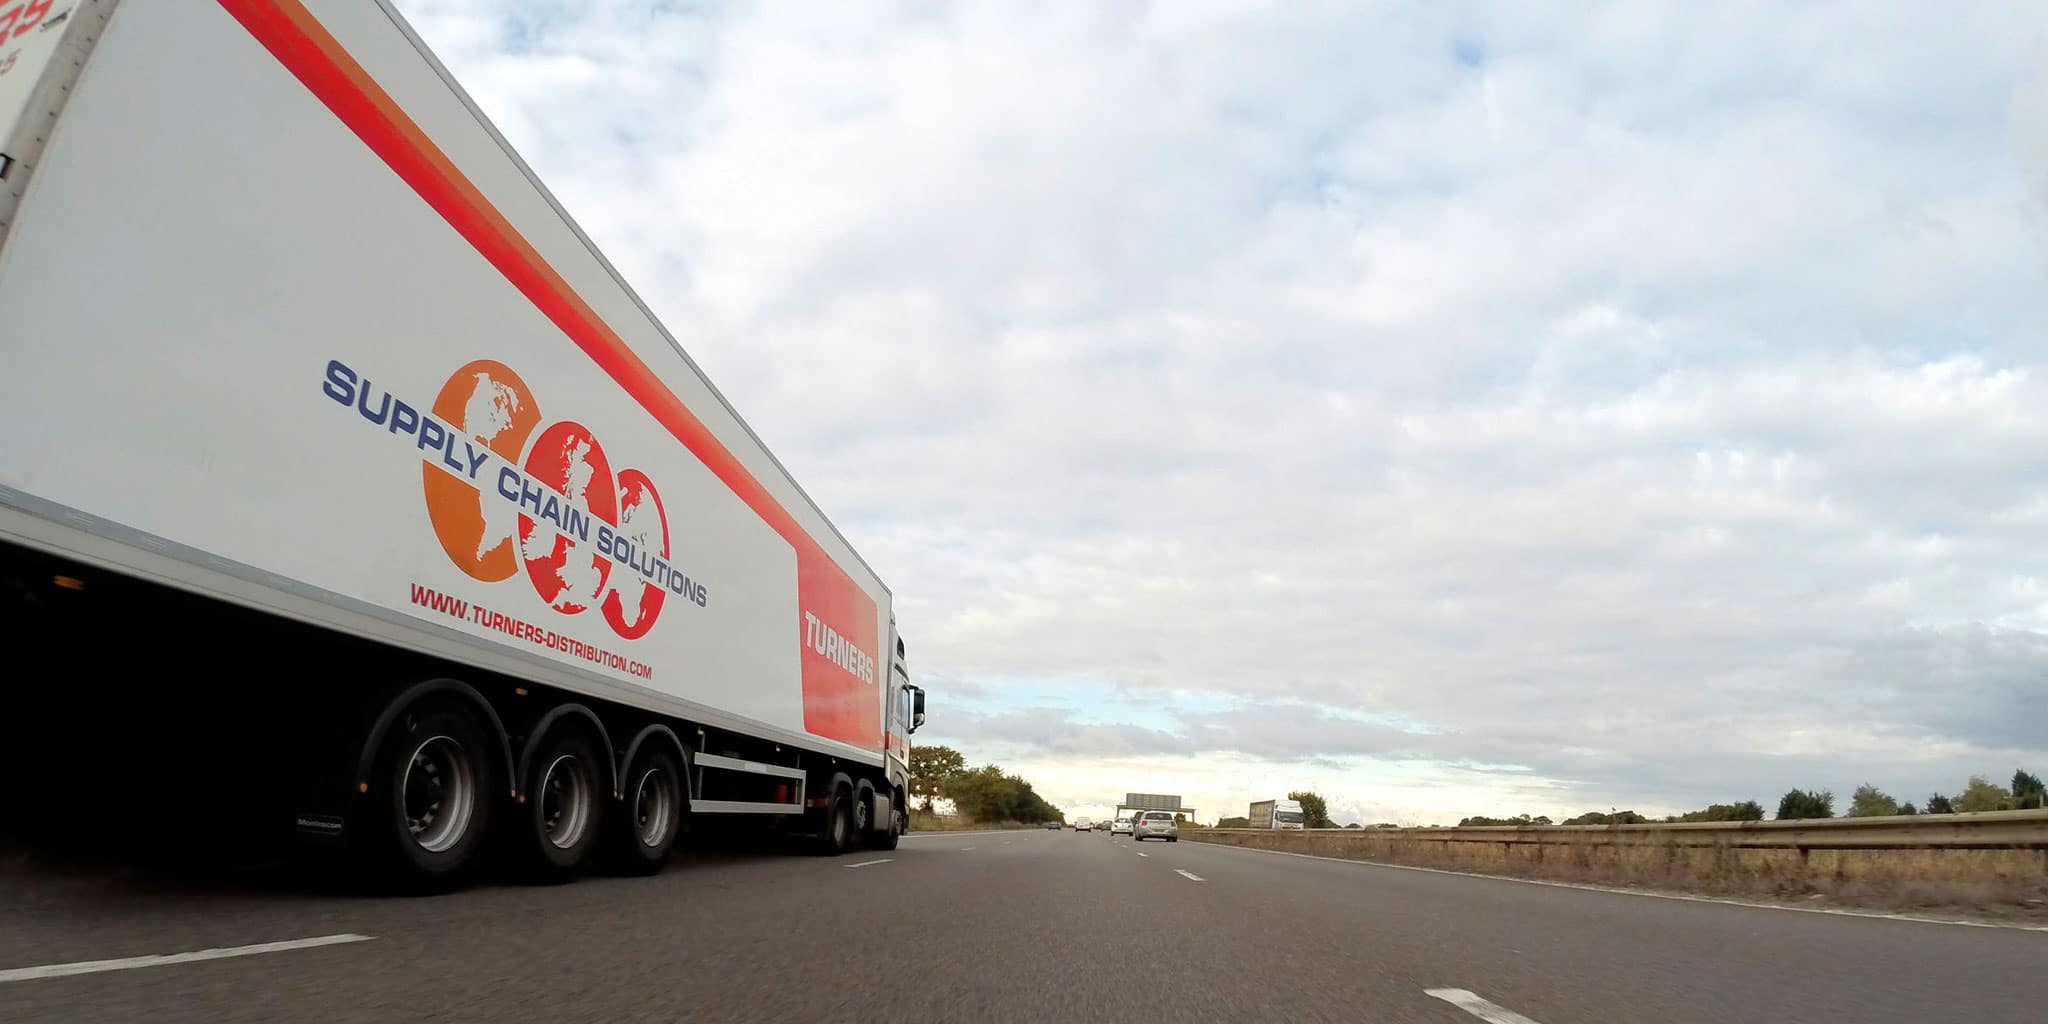 Fokus-Milieu-Supply Chain Solutions vrachtwagen